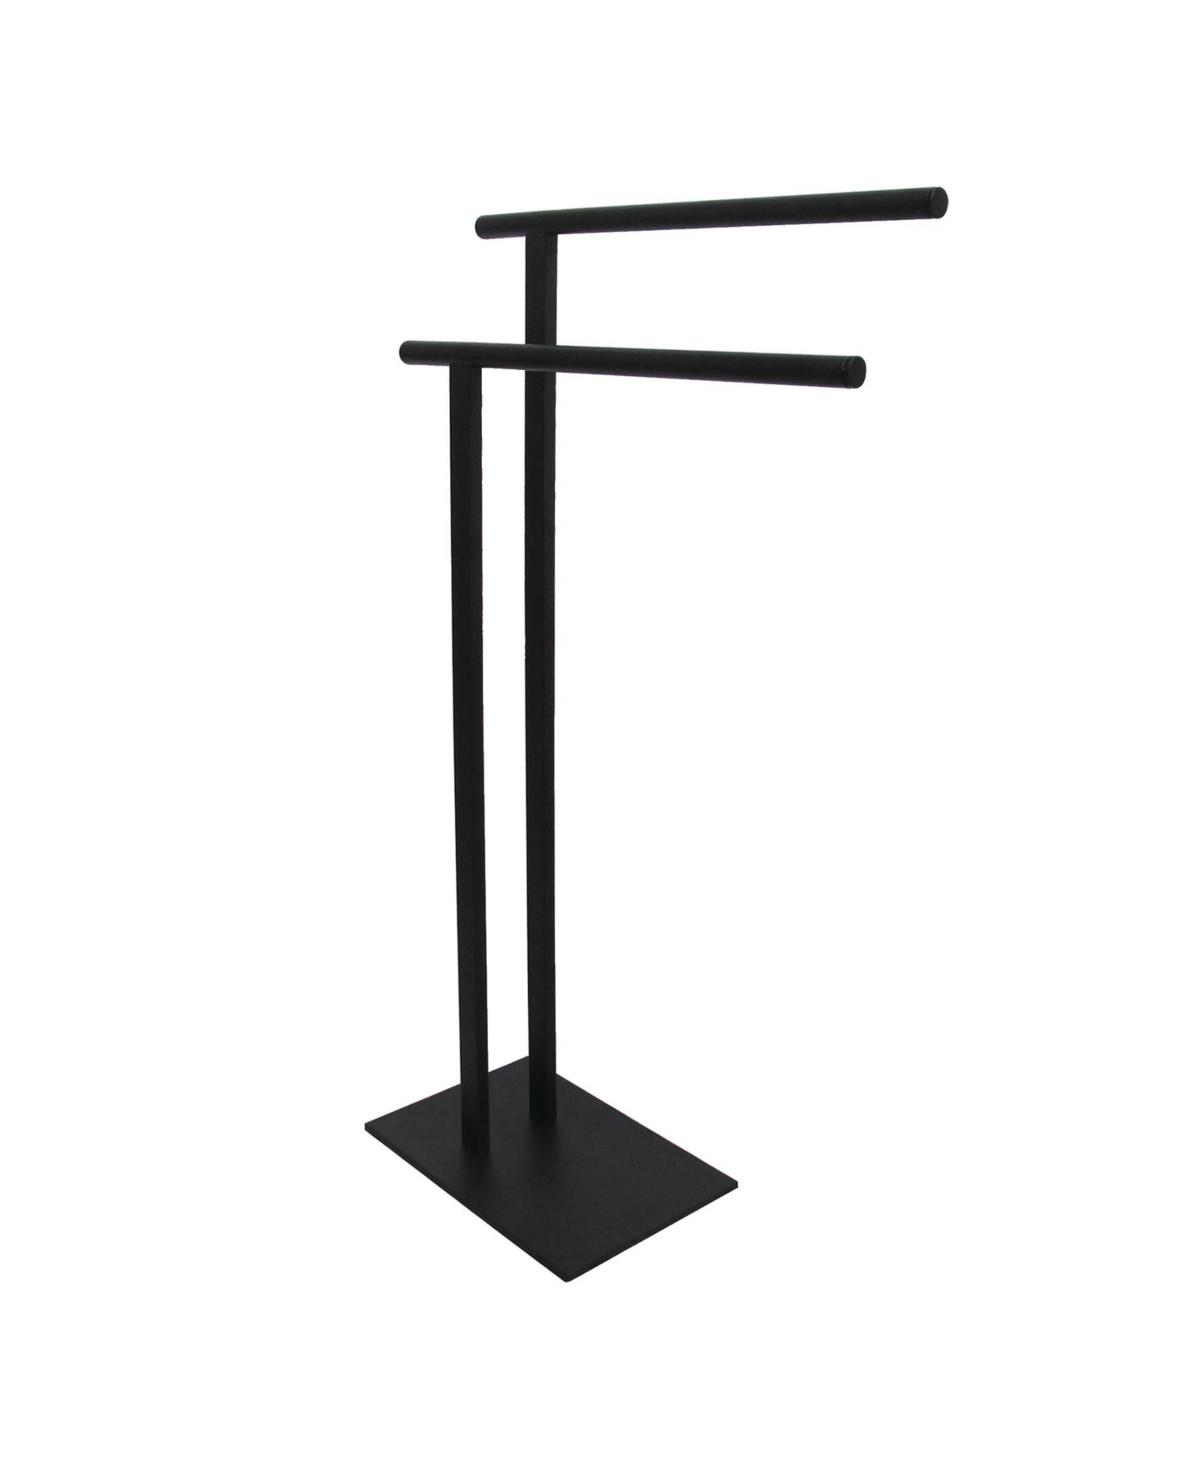 Kingston Brass Double L Shape Pedestal Towel Holder in Matte Black Bedding